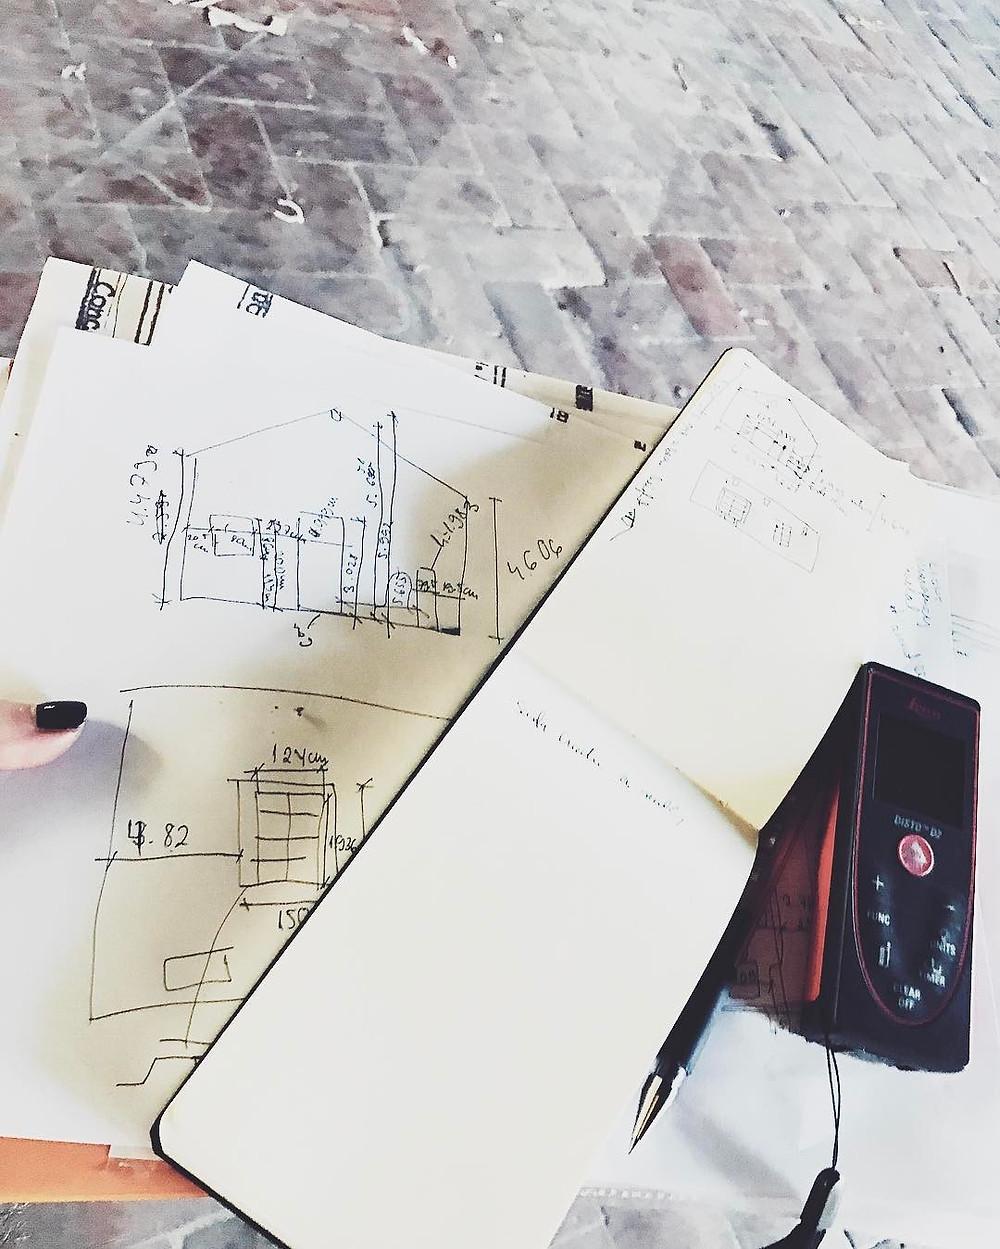 Technical - tools - Florence - Architecture - Interior - Design - School